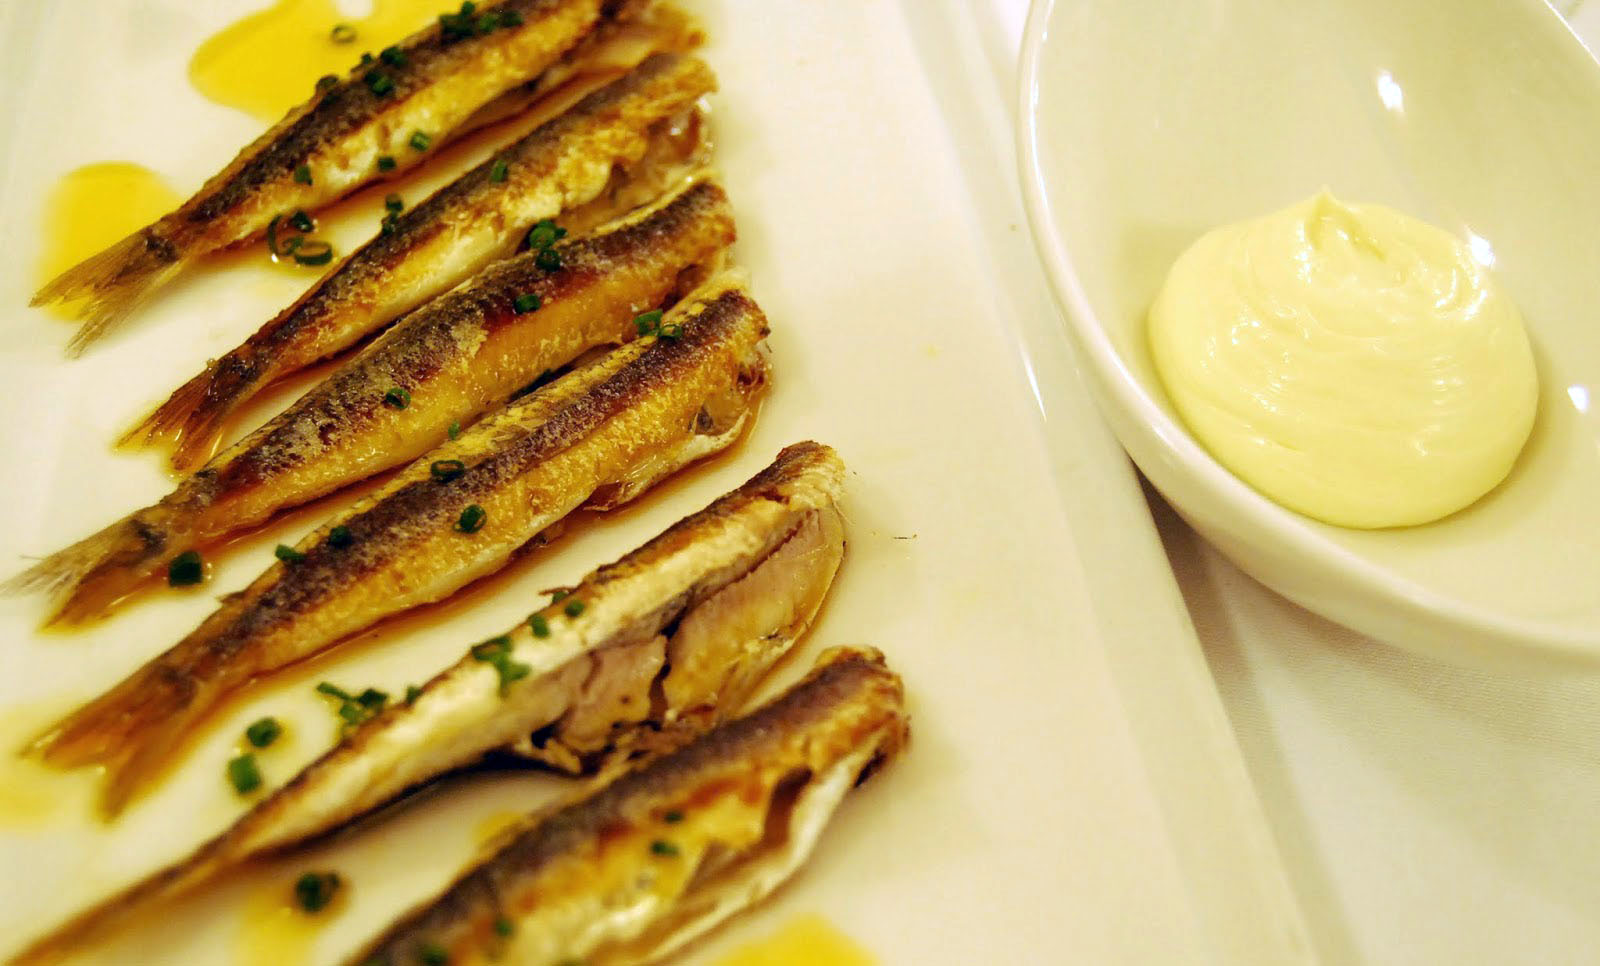 Bonanova: salmonetes con parmentier de patata y ajada. Foto: Eduard Ros